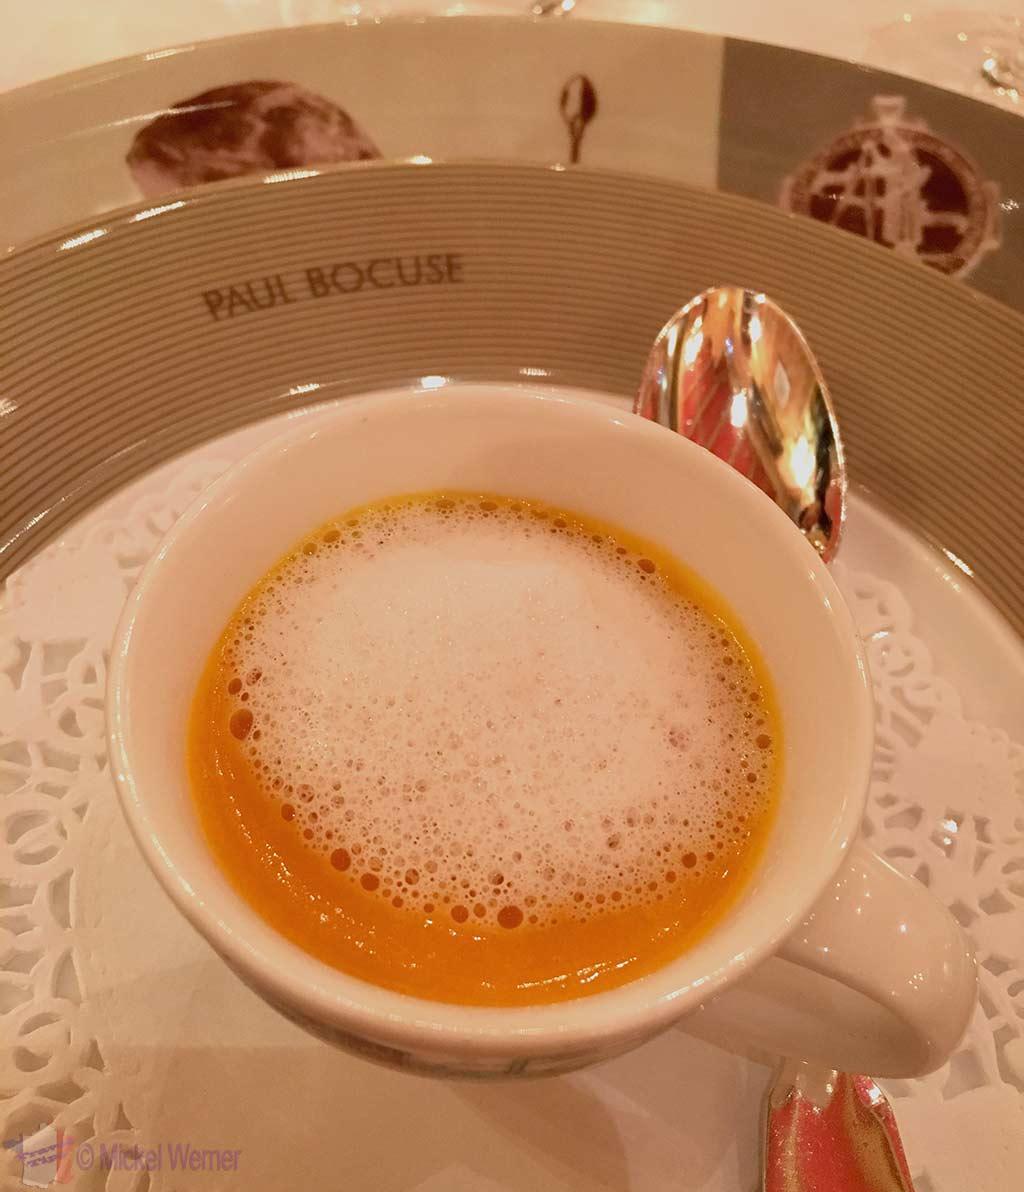 """In between"" food at Paul Bocuse restaurant"